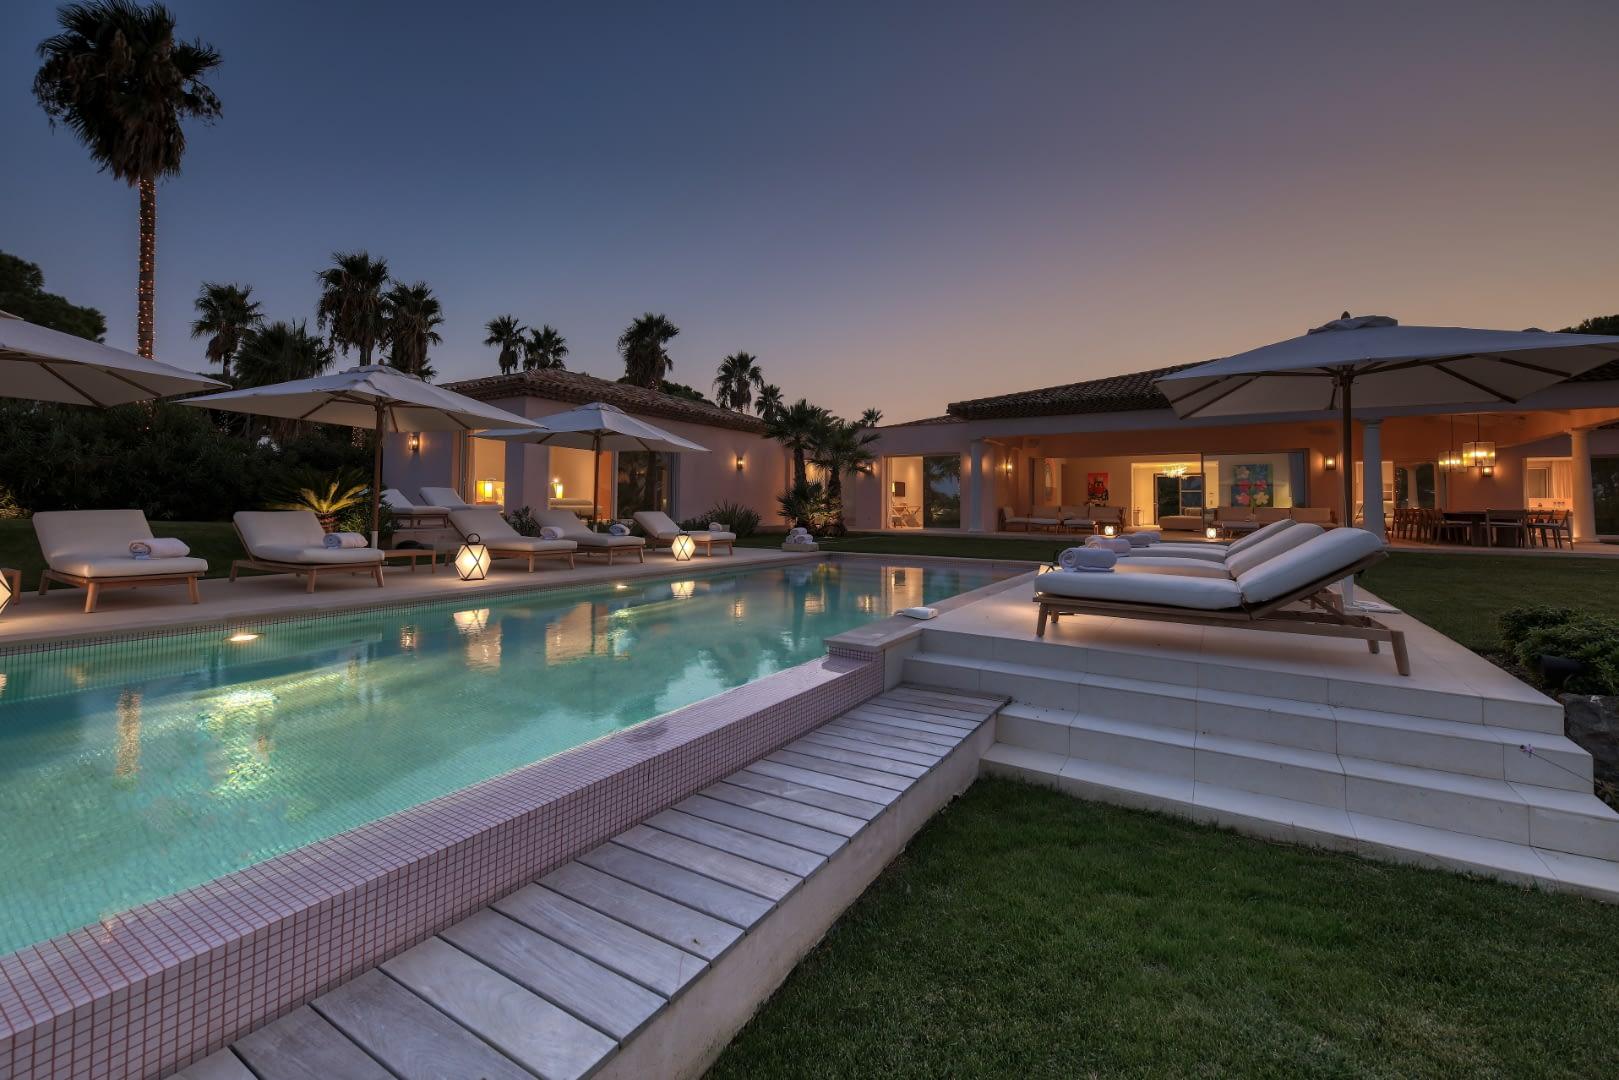 Elegant Villa with Panoramic Views of Pampelonne Beach, St Tropez, France